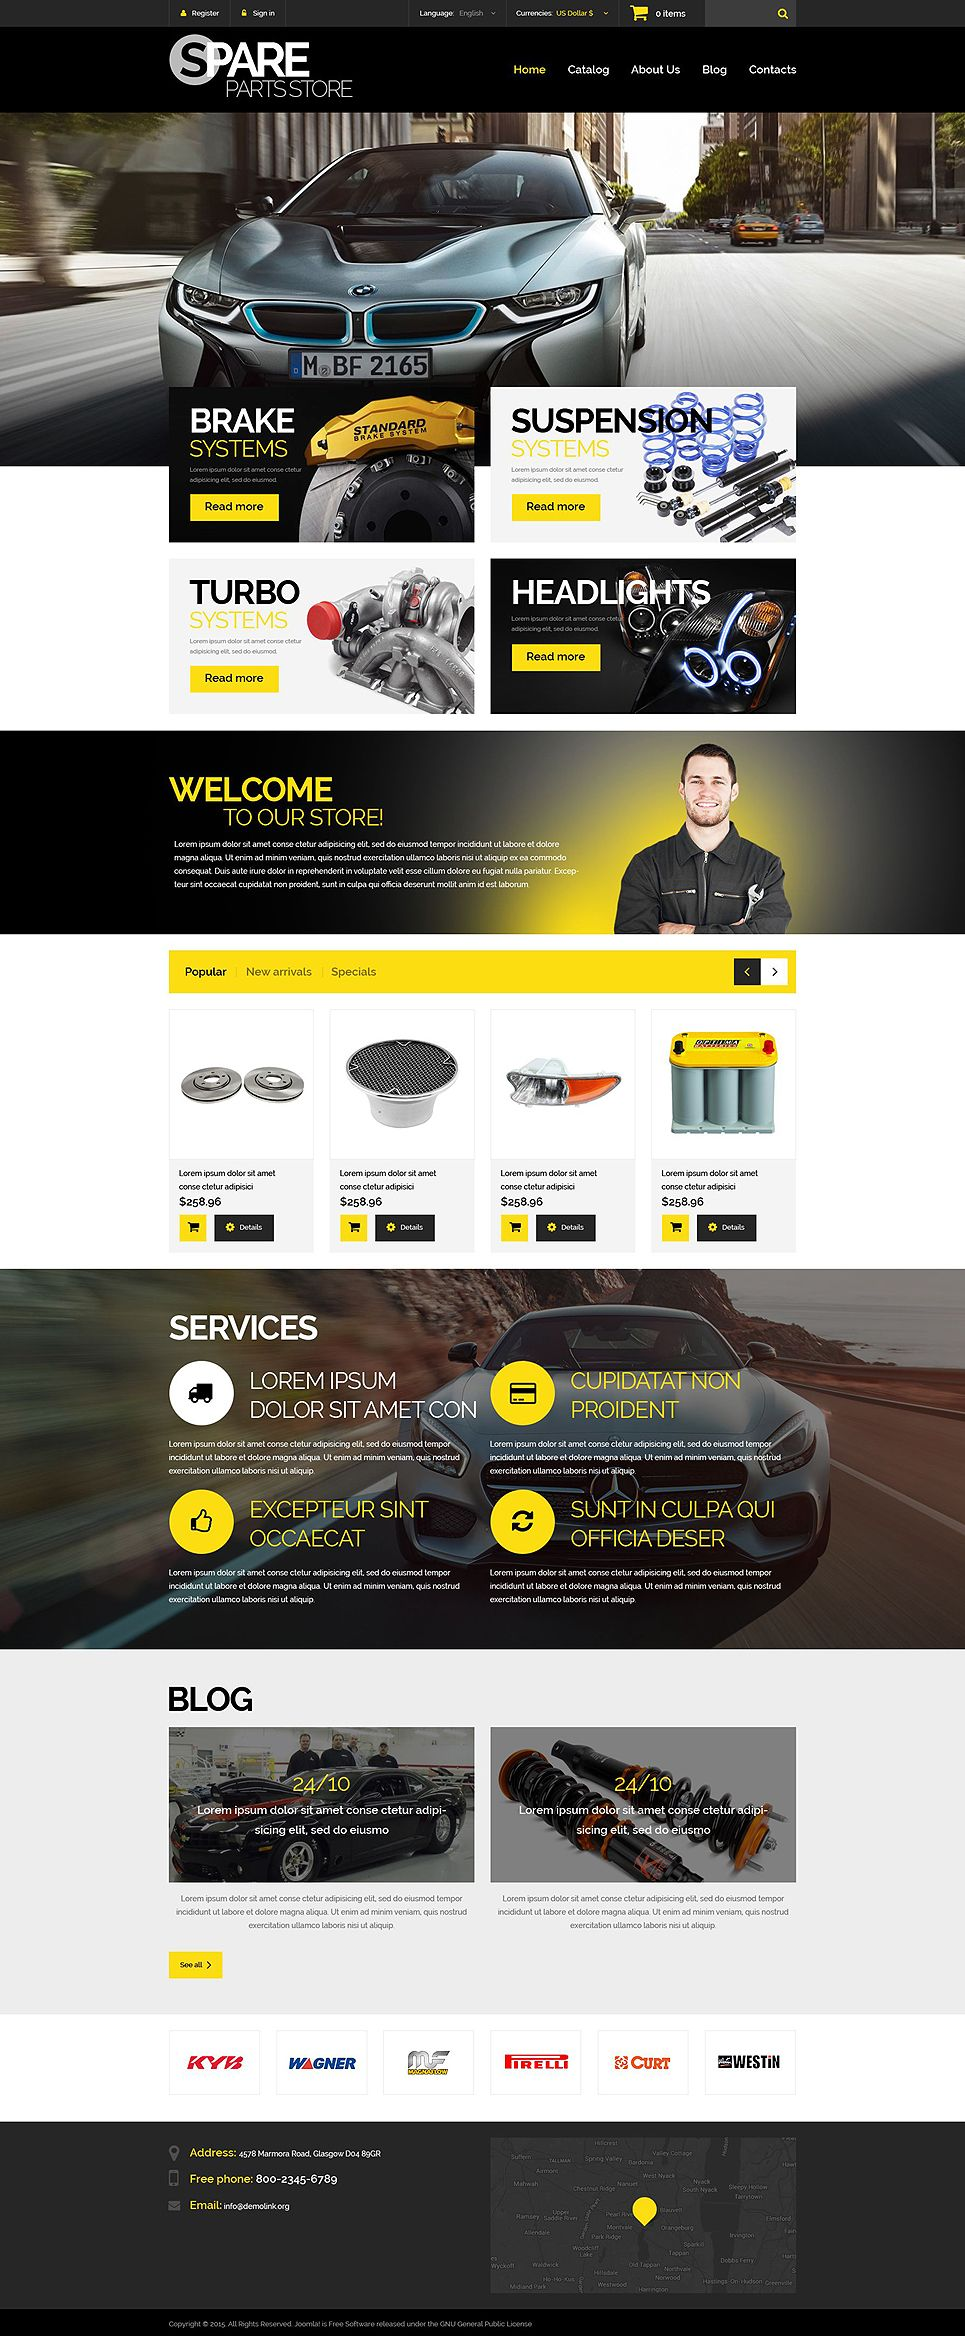 Spare Parts Store Prestashop Theme Prestashop Themes Web Design